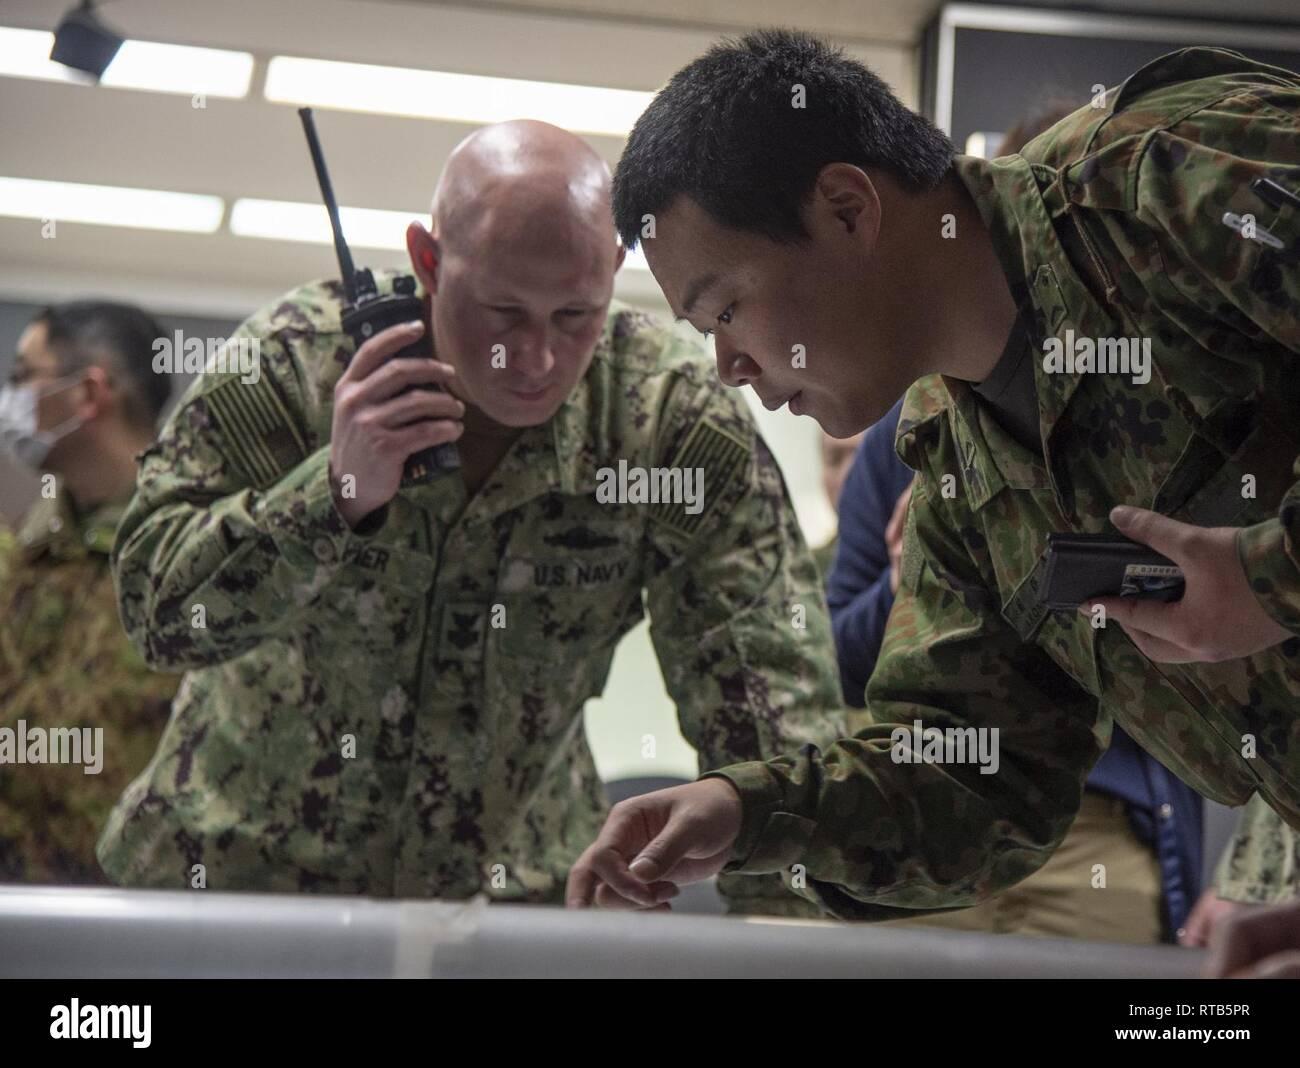 YOKOSUKA, Japan (Feb  7, 2019) Master-at-Arms 1st Class Tommy Hayner